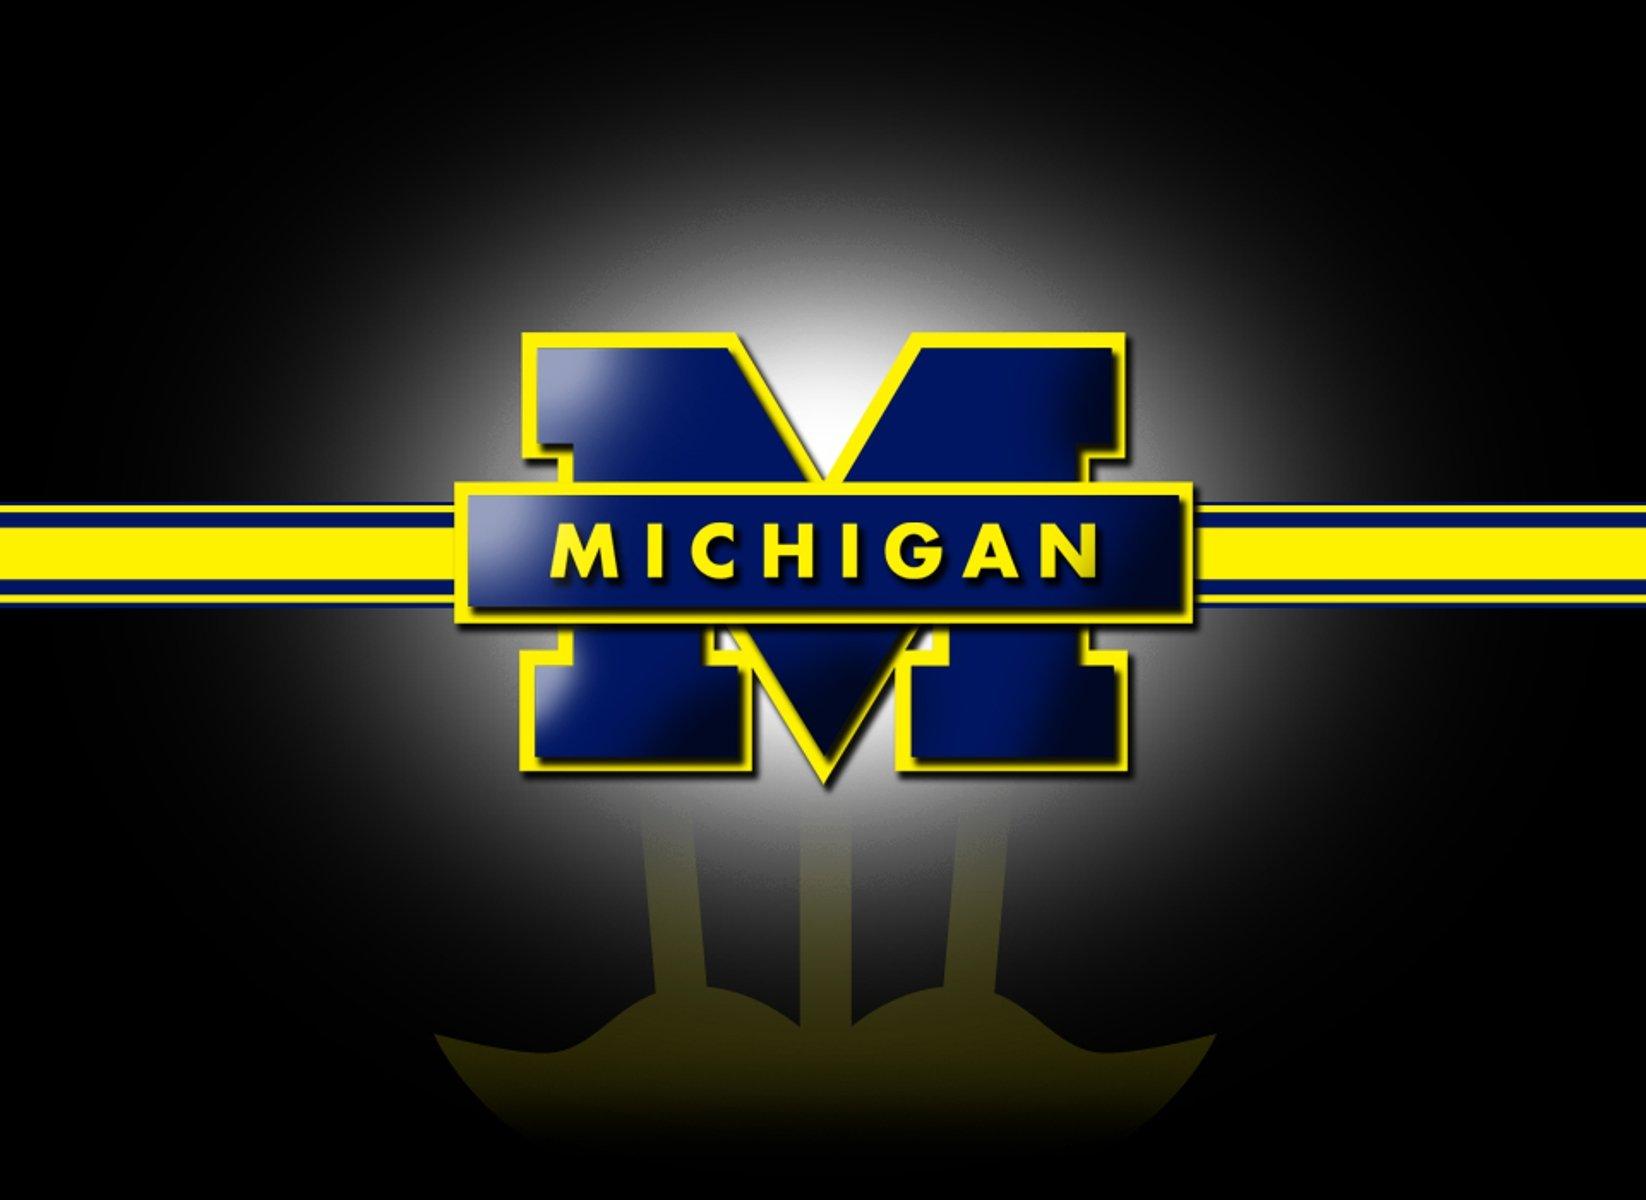 Michigan State University Wallpapers: Michigan Football IPhone Wallpaper